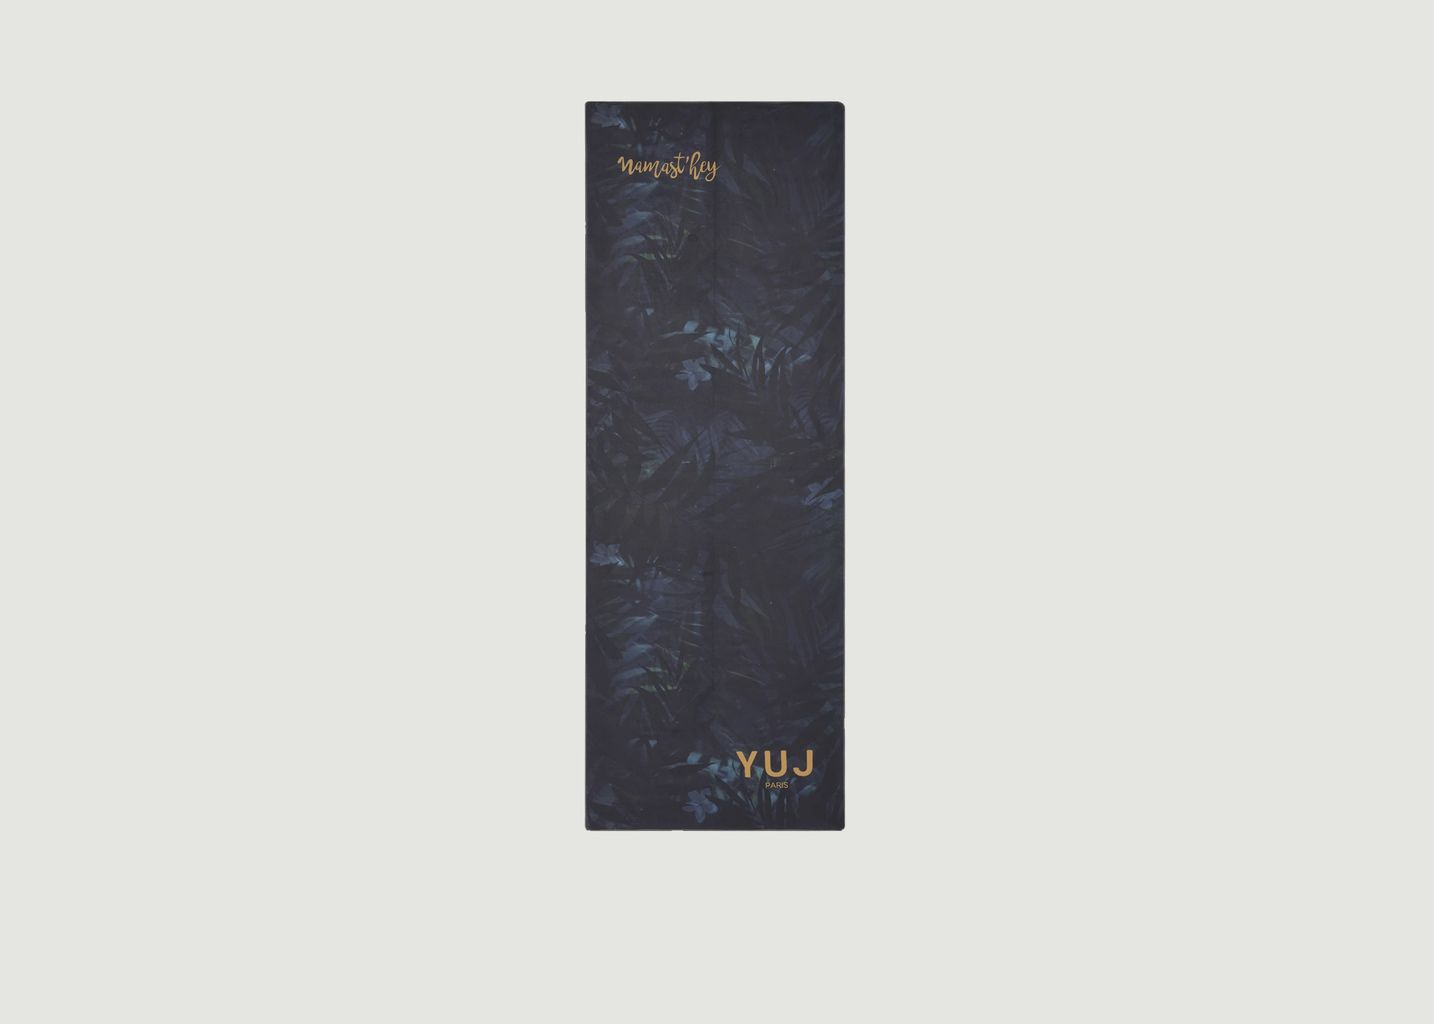 Tapis de yoga motif tropical Namast'hey - YUJ Paris